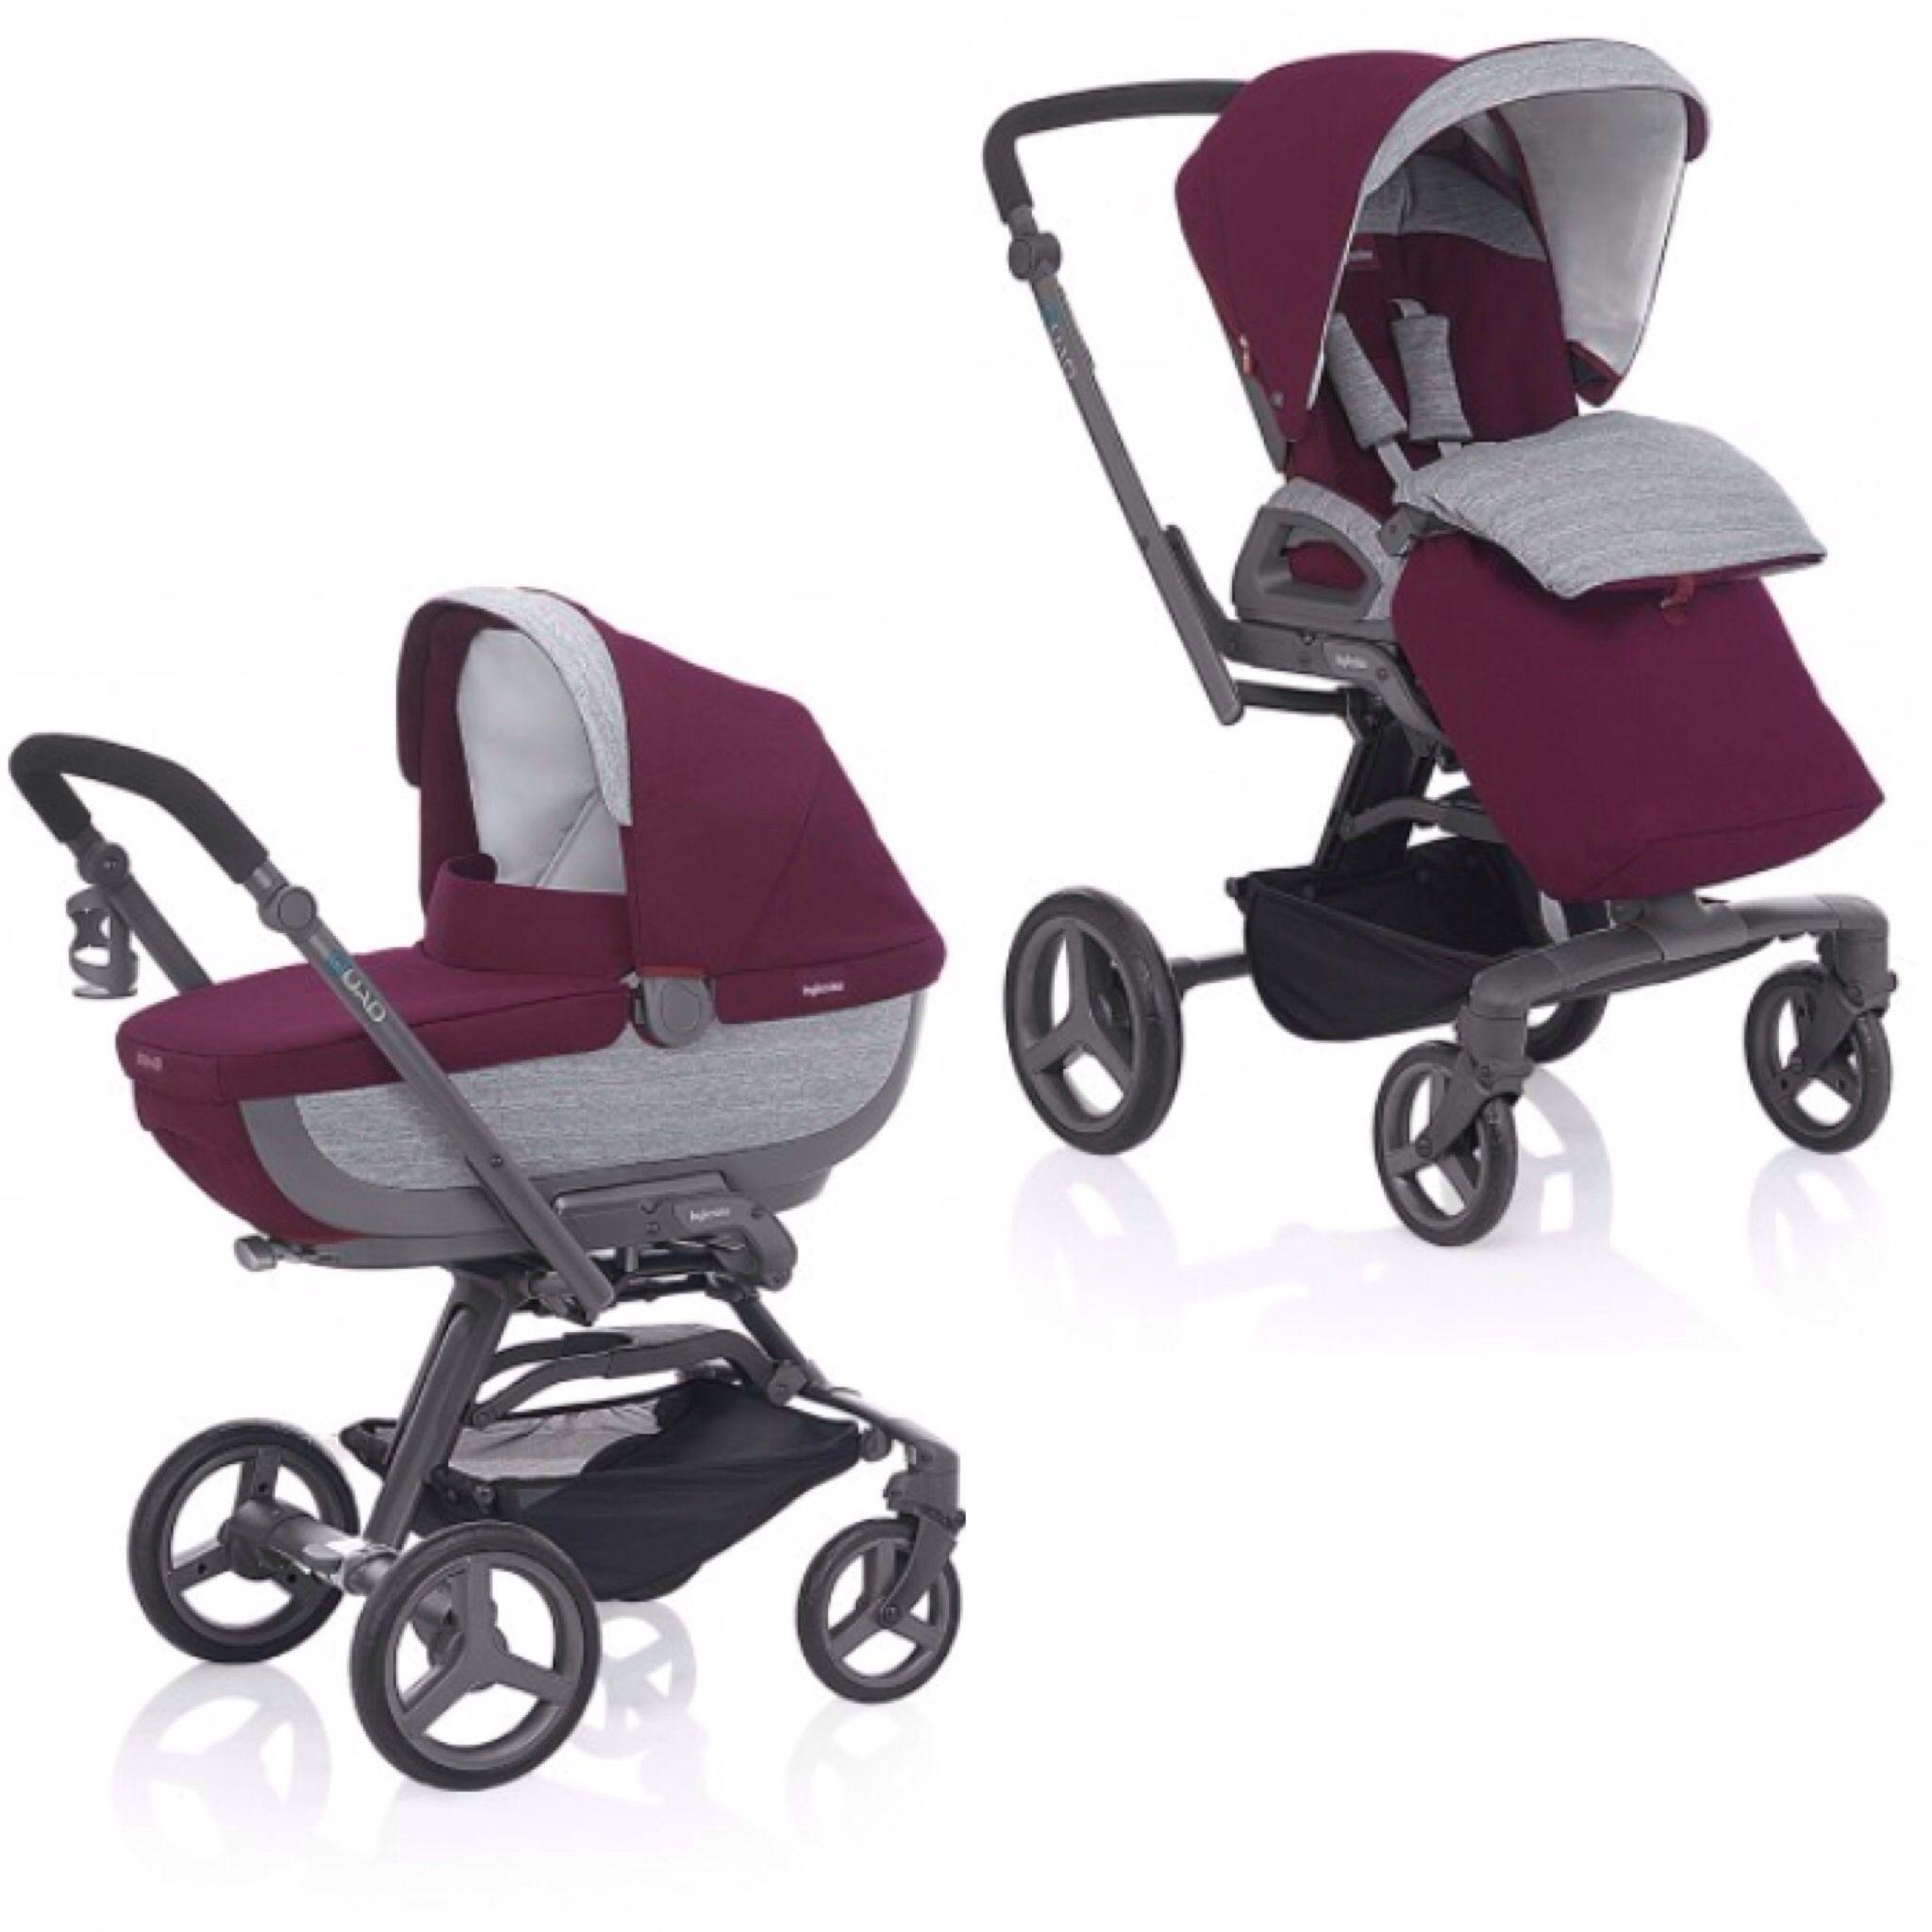 Inglesina Quad Stroller with push chair seat & bassinet my wish list love